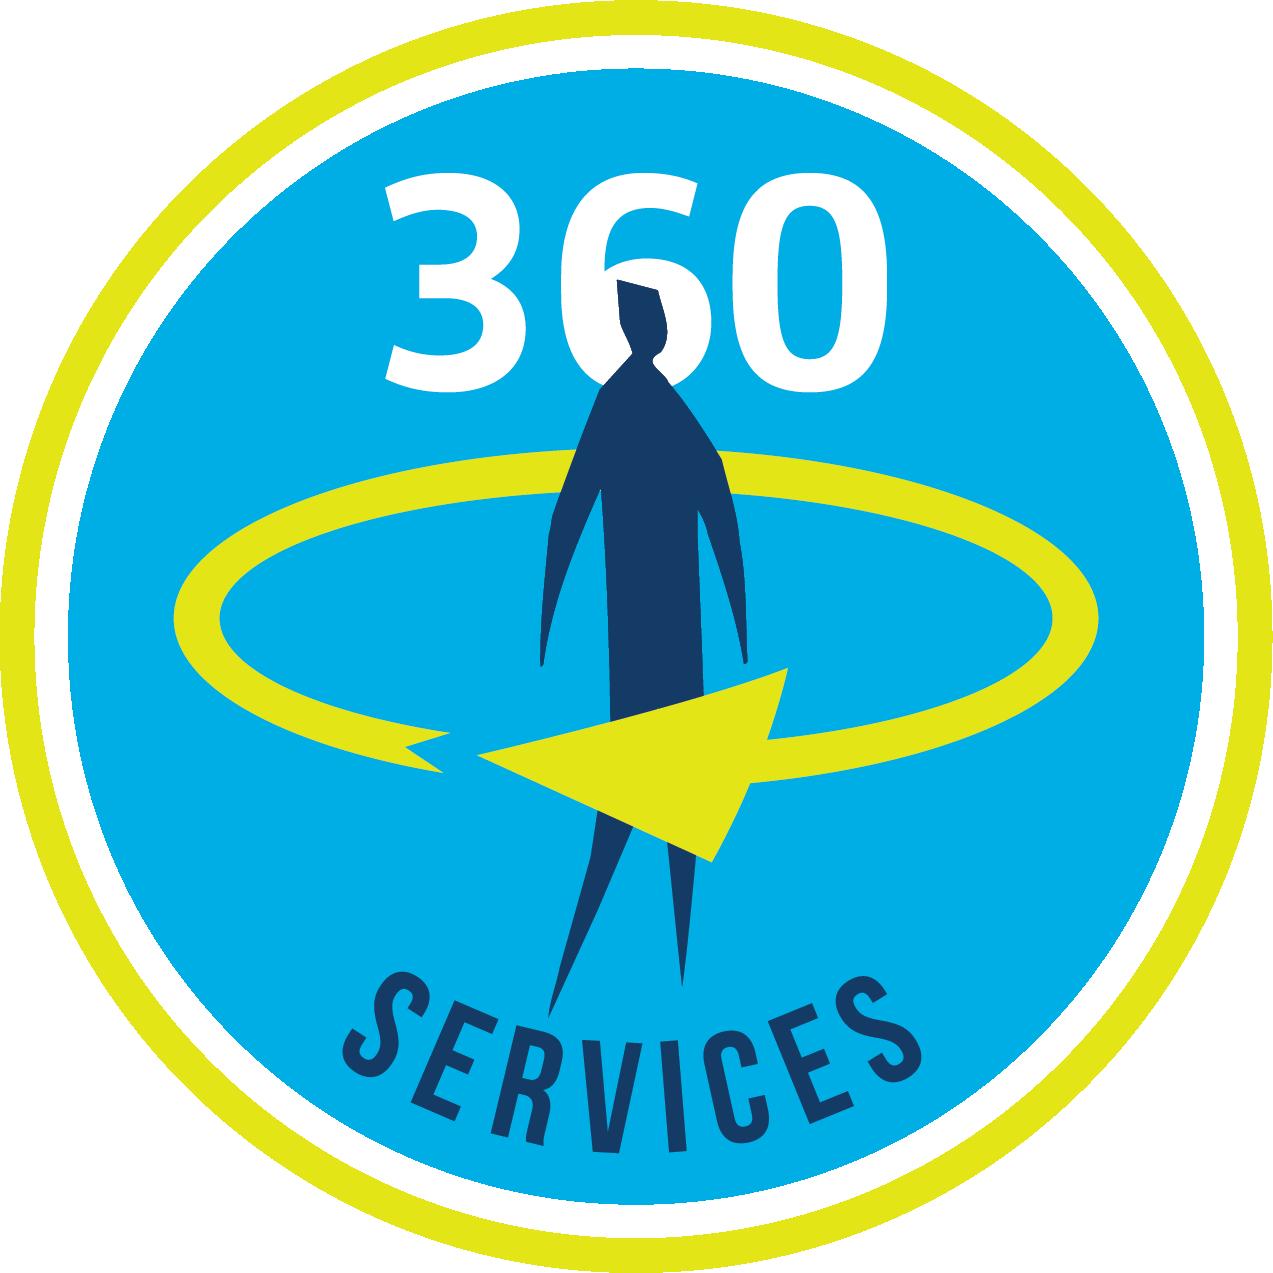 aclvb-universele_diensten-logo-cmyk_ok_fr_1.png